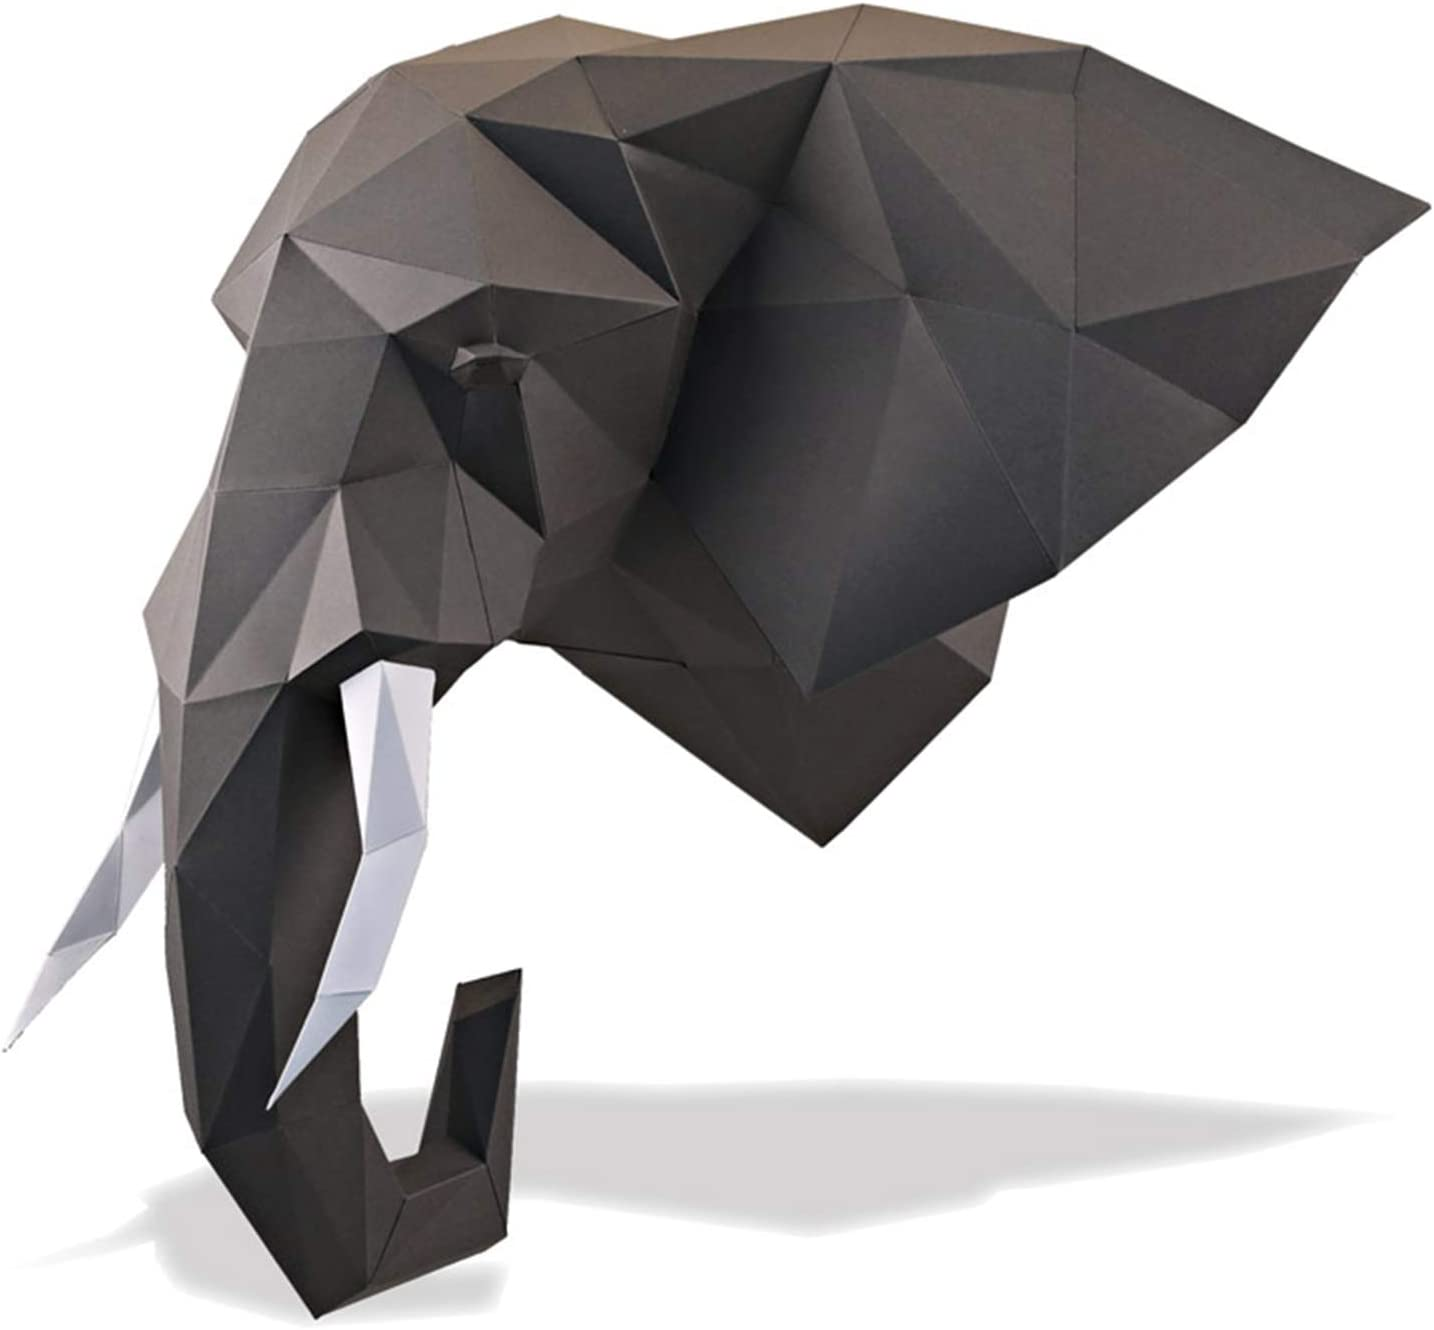 3d Origami Elephant Instructions | 3d Origami Korb Wir Basteln Aus ... | 1338x1436